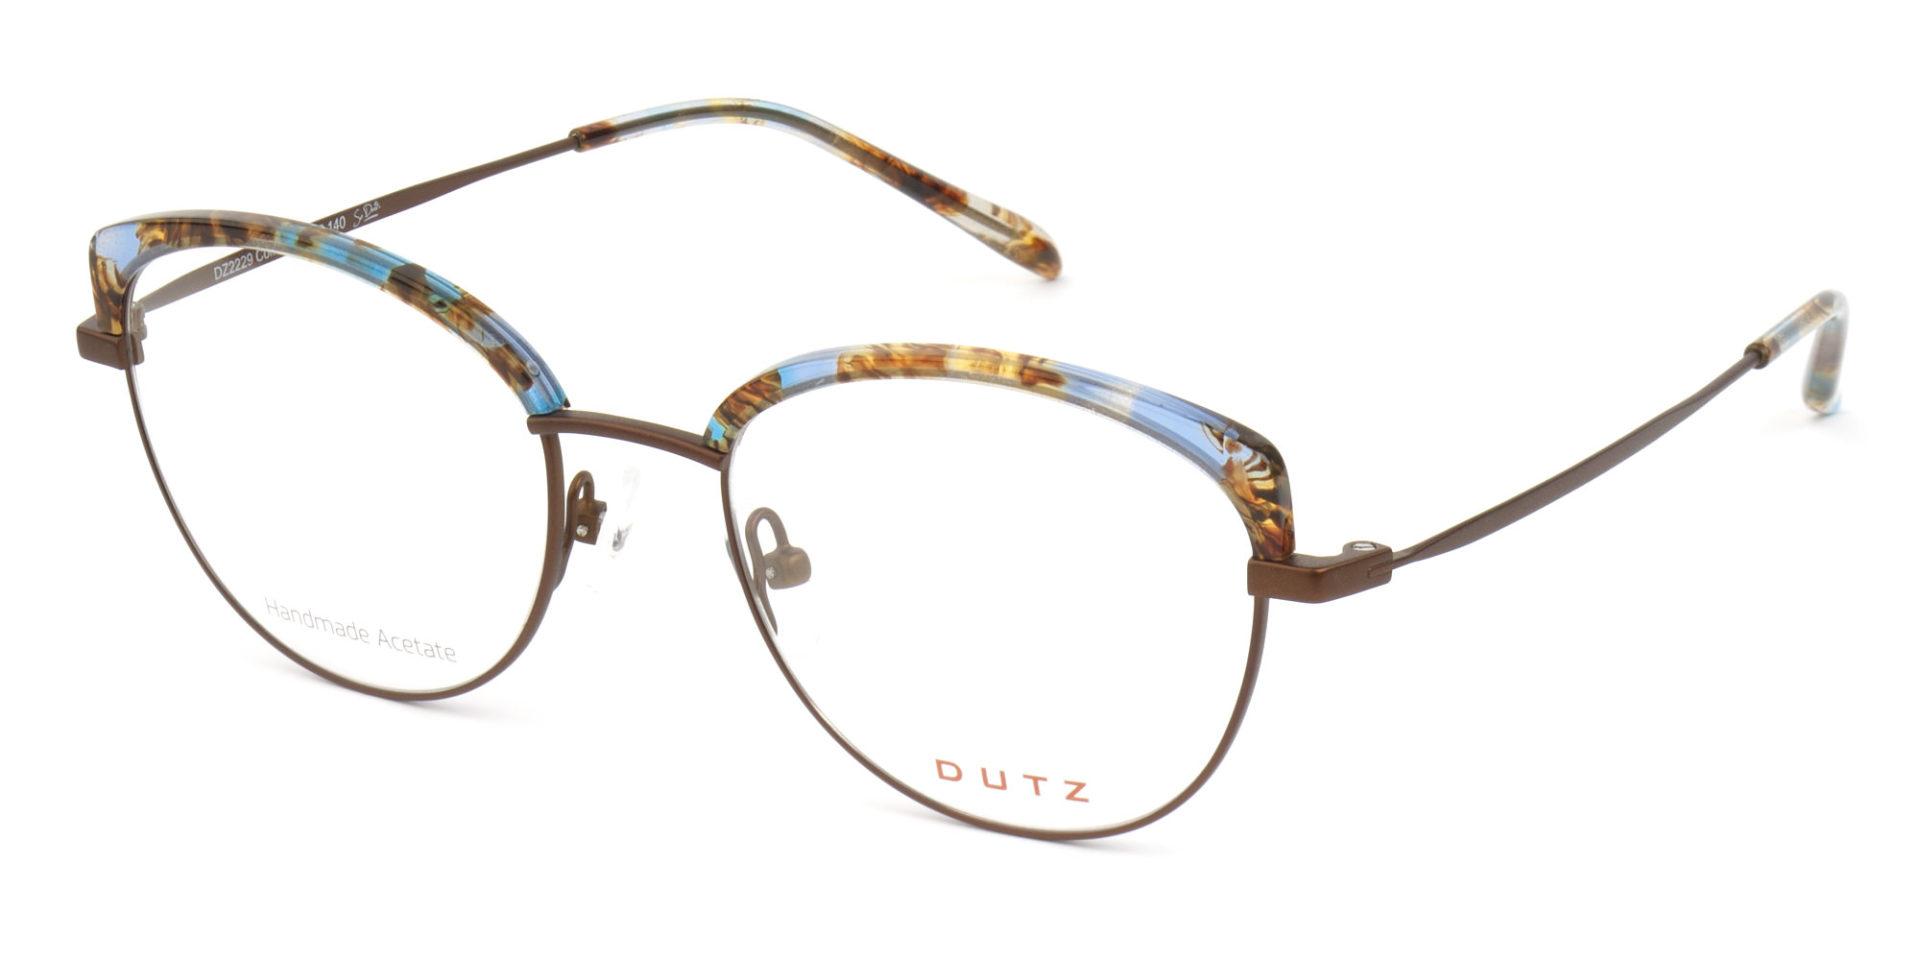 DZ2229-35